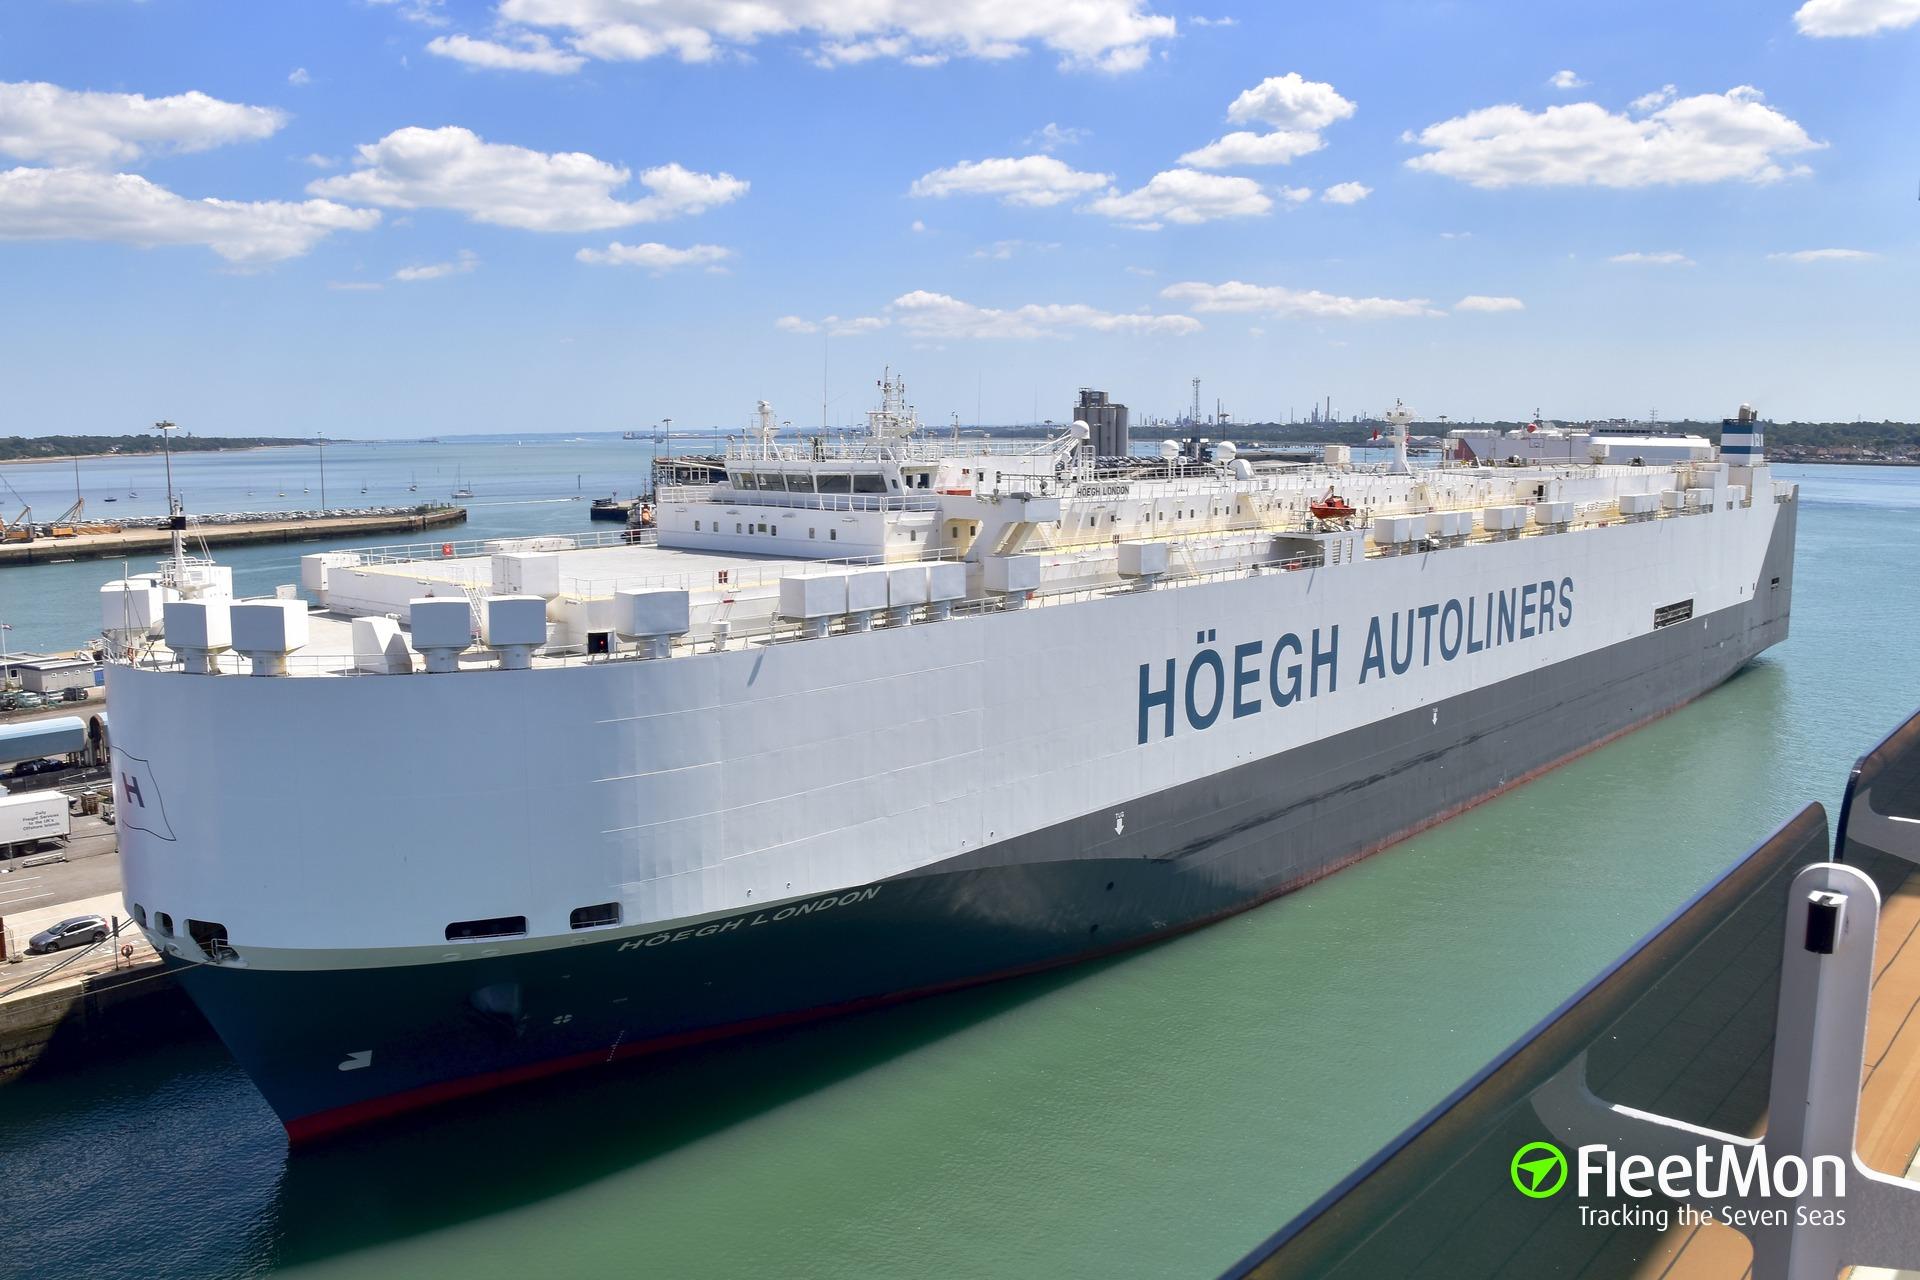 HOEGH car carrier damaged by storm in Mediterranean